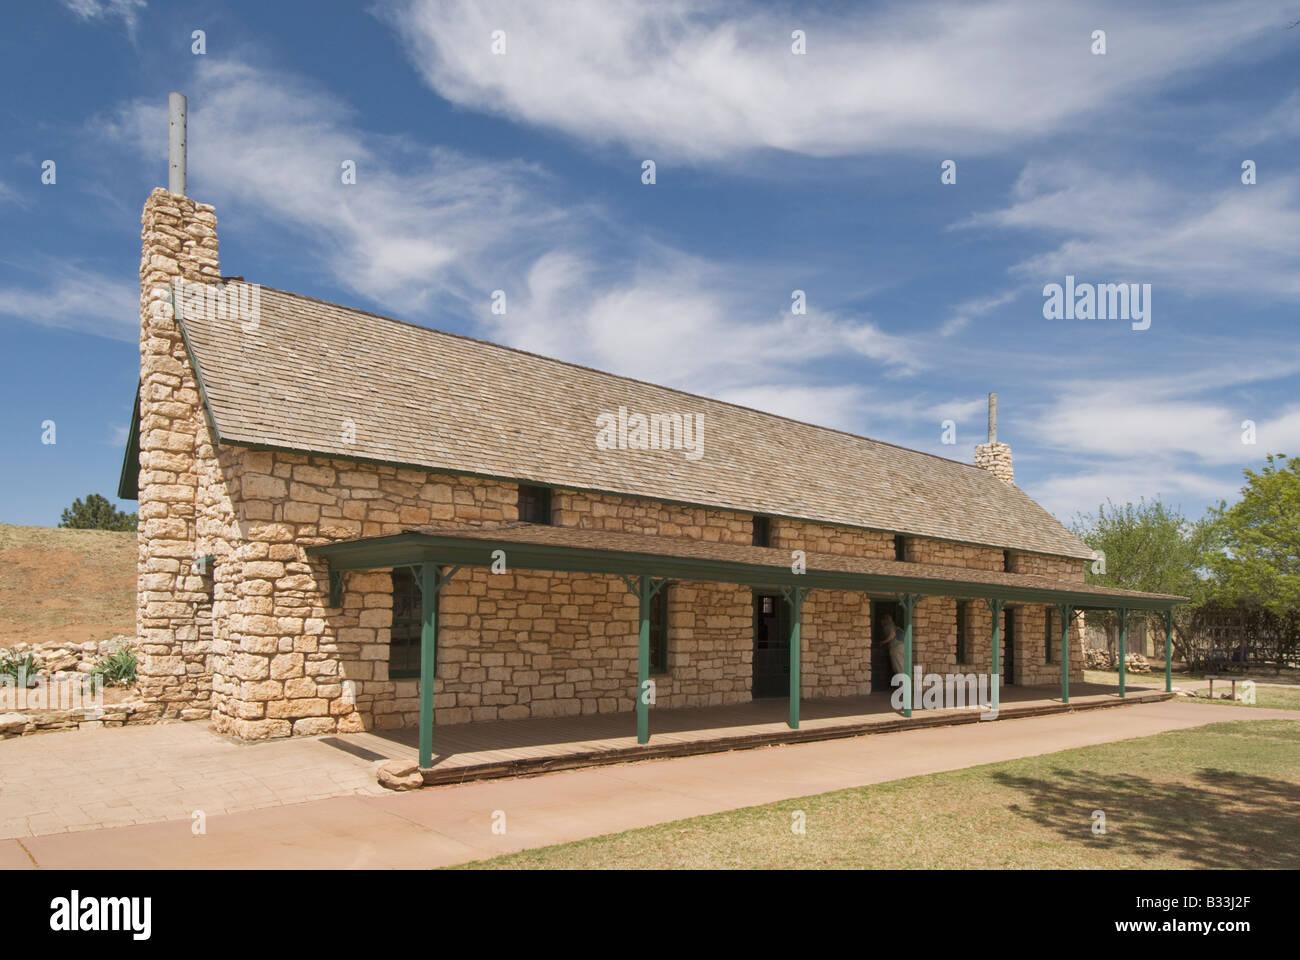 Texas Lubbock National Ranching Heritage Center Las Escarbadas Stock Photo